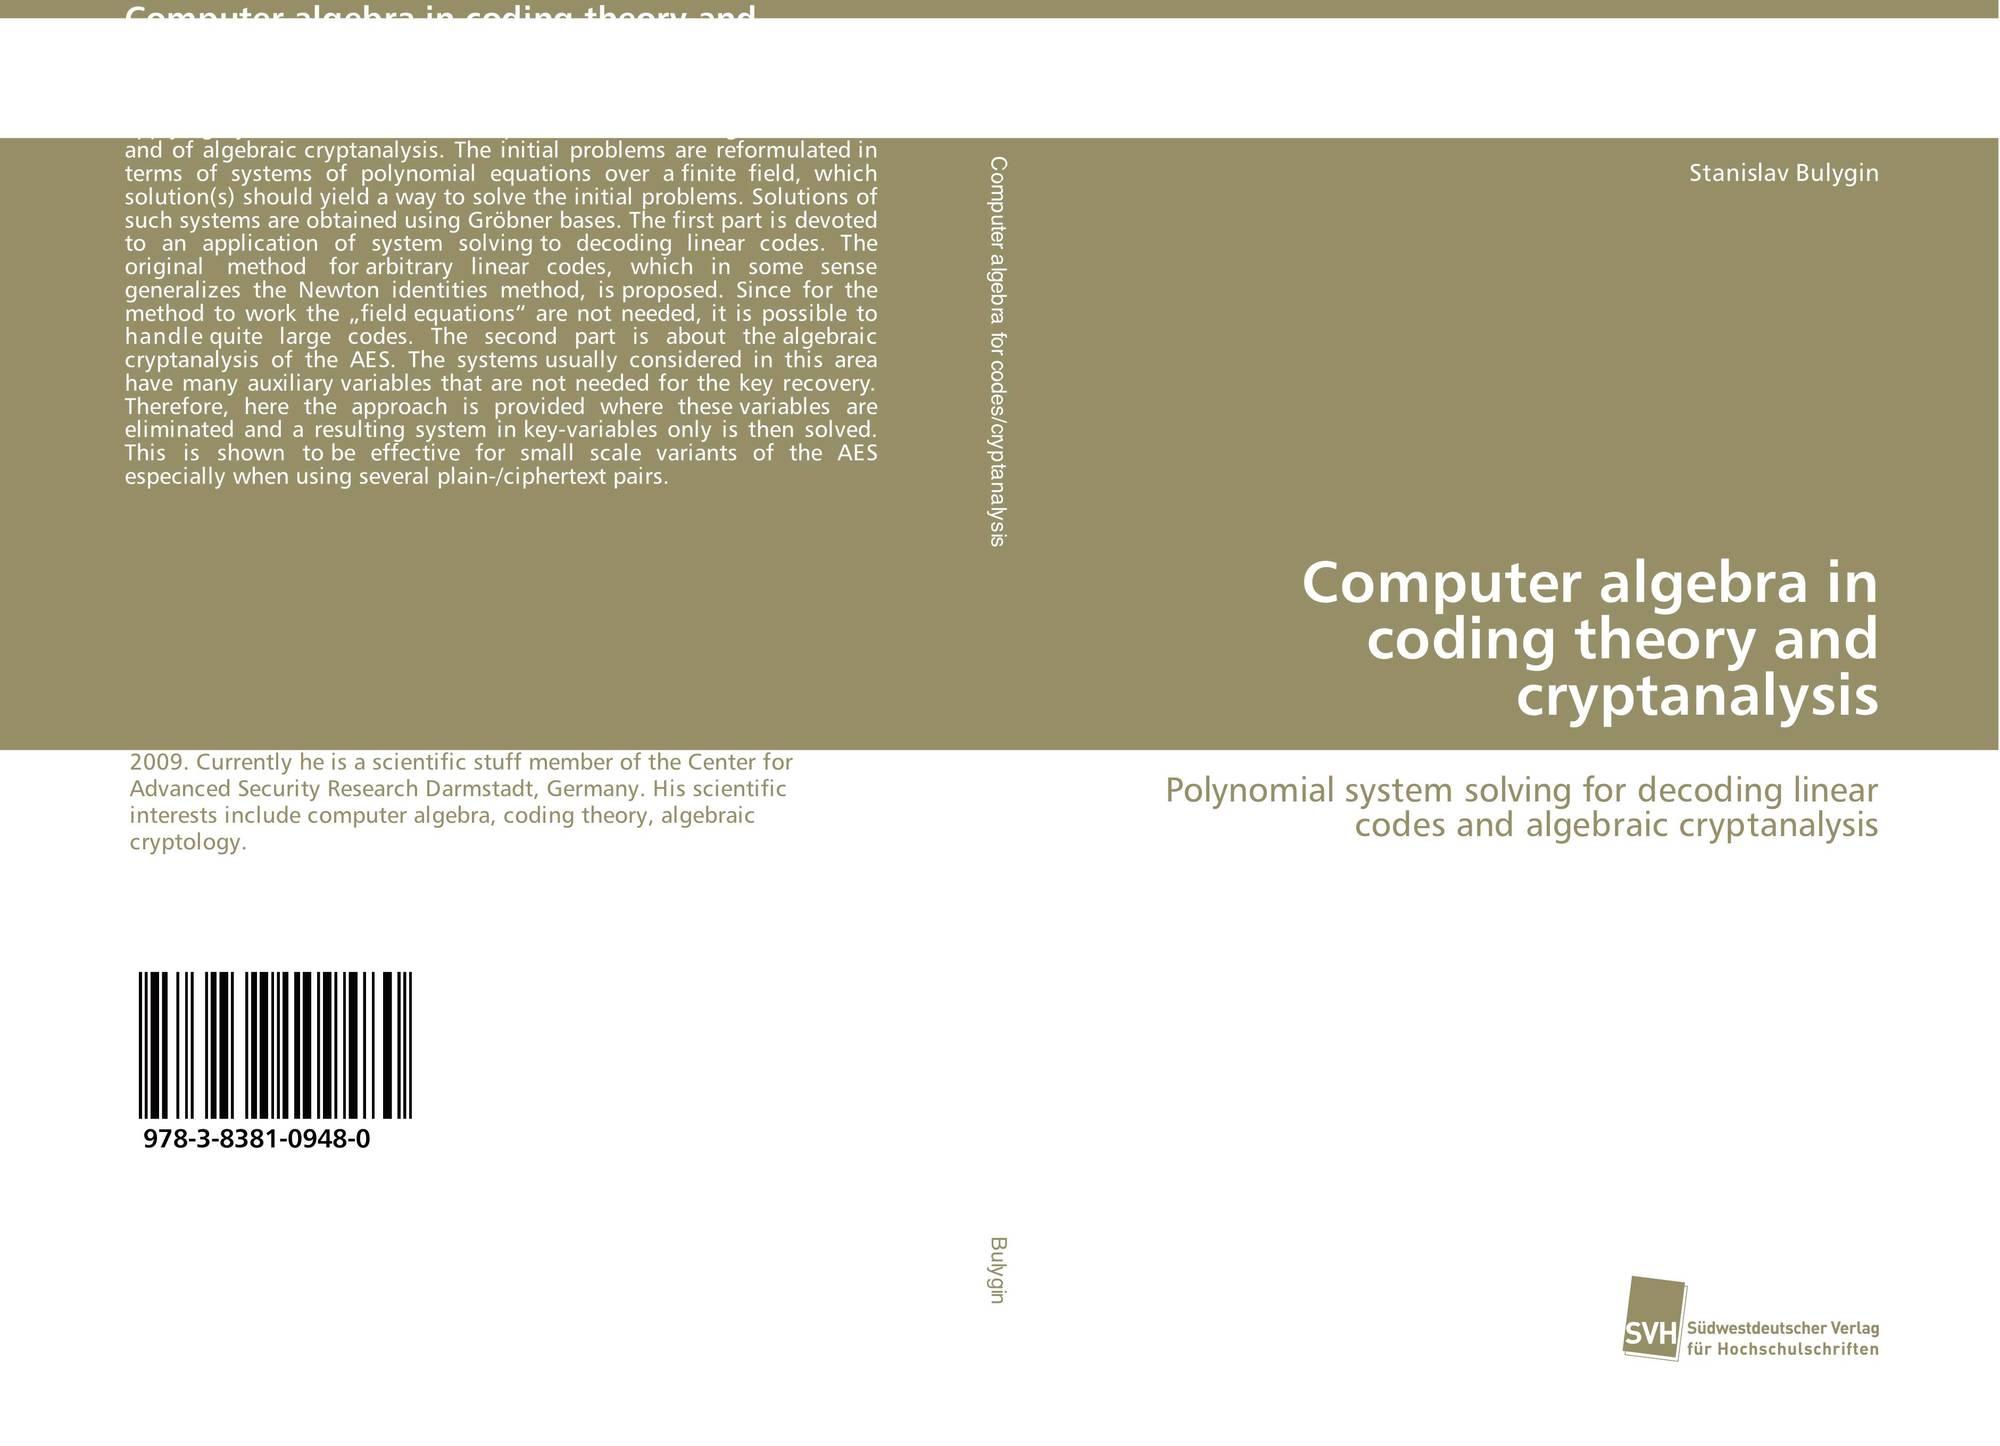 Computer algebra in coding theory and cryptanalysis, 978-3